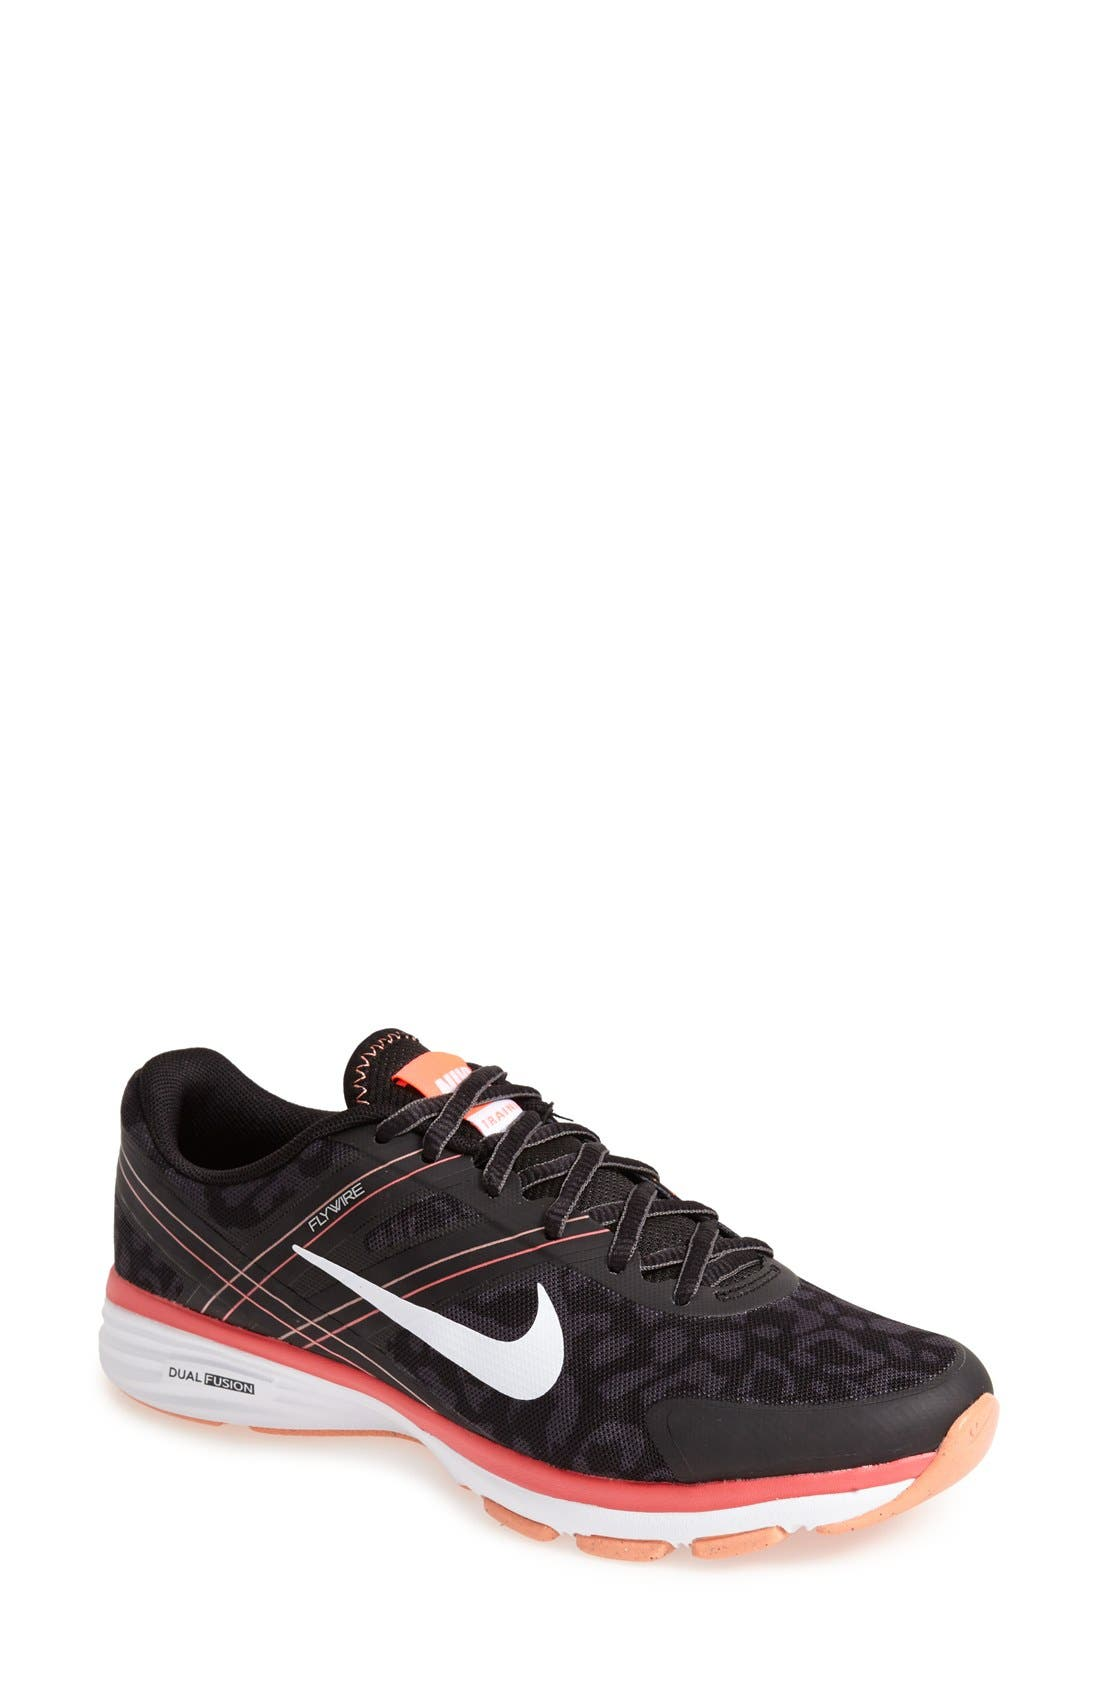 Alternate Image 1 Selected - Nike 'Dual Fusion TR II' Training Shoe (Women)